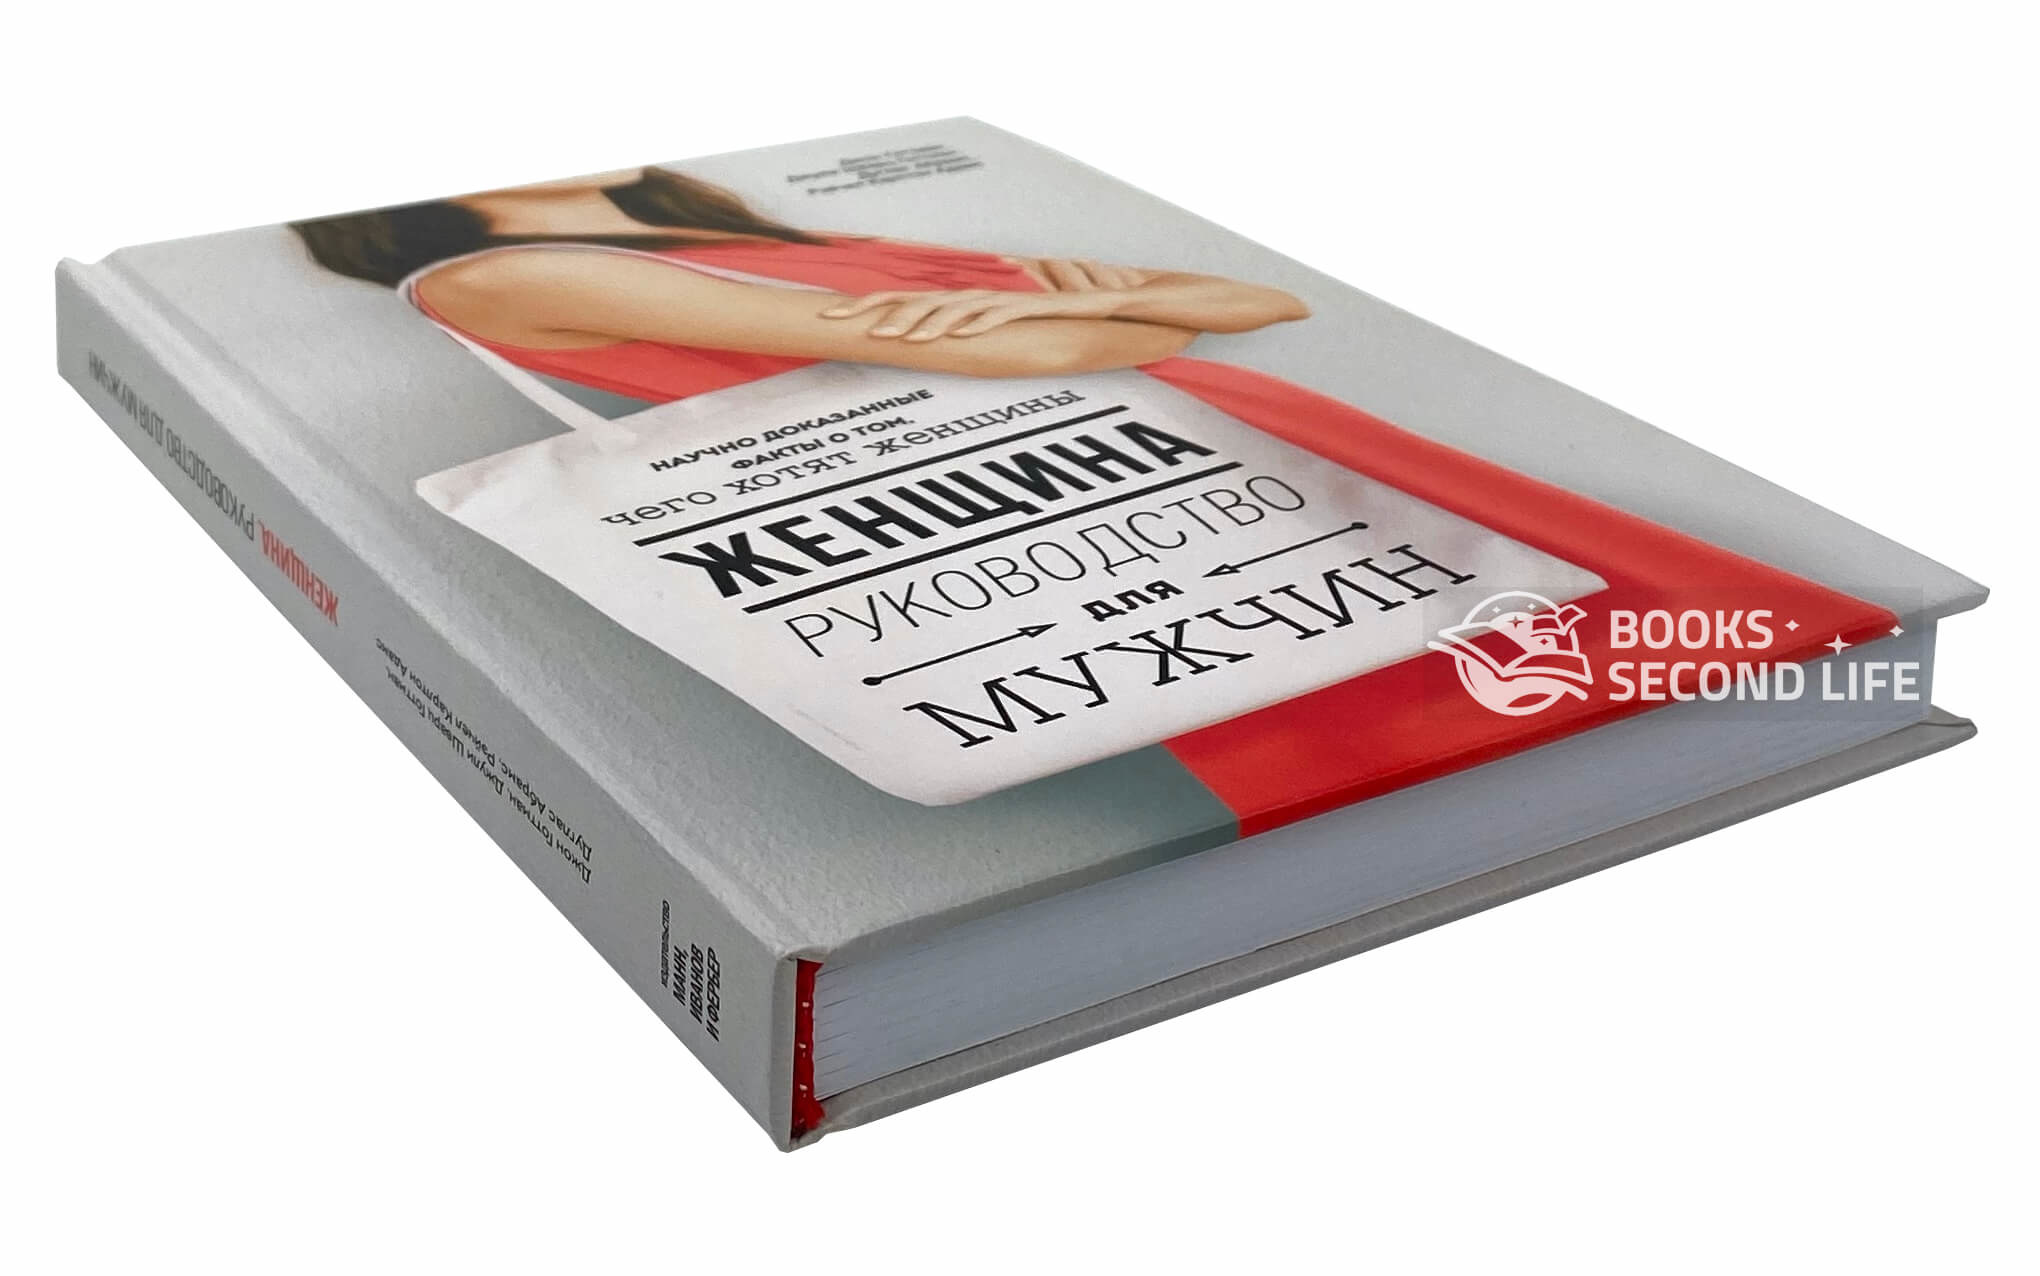 Женщина. Руководство для мужчин. Автор — Джон Готтман, Джули Шварц Готтман, Дуглас Абрамс, Рэйчел Карлтон Адамс. Переплет —